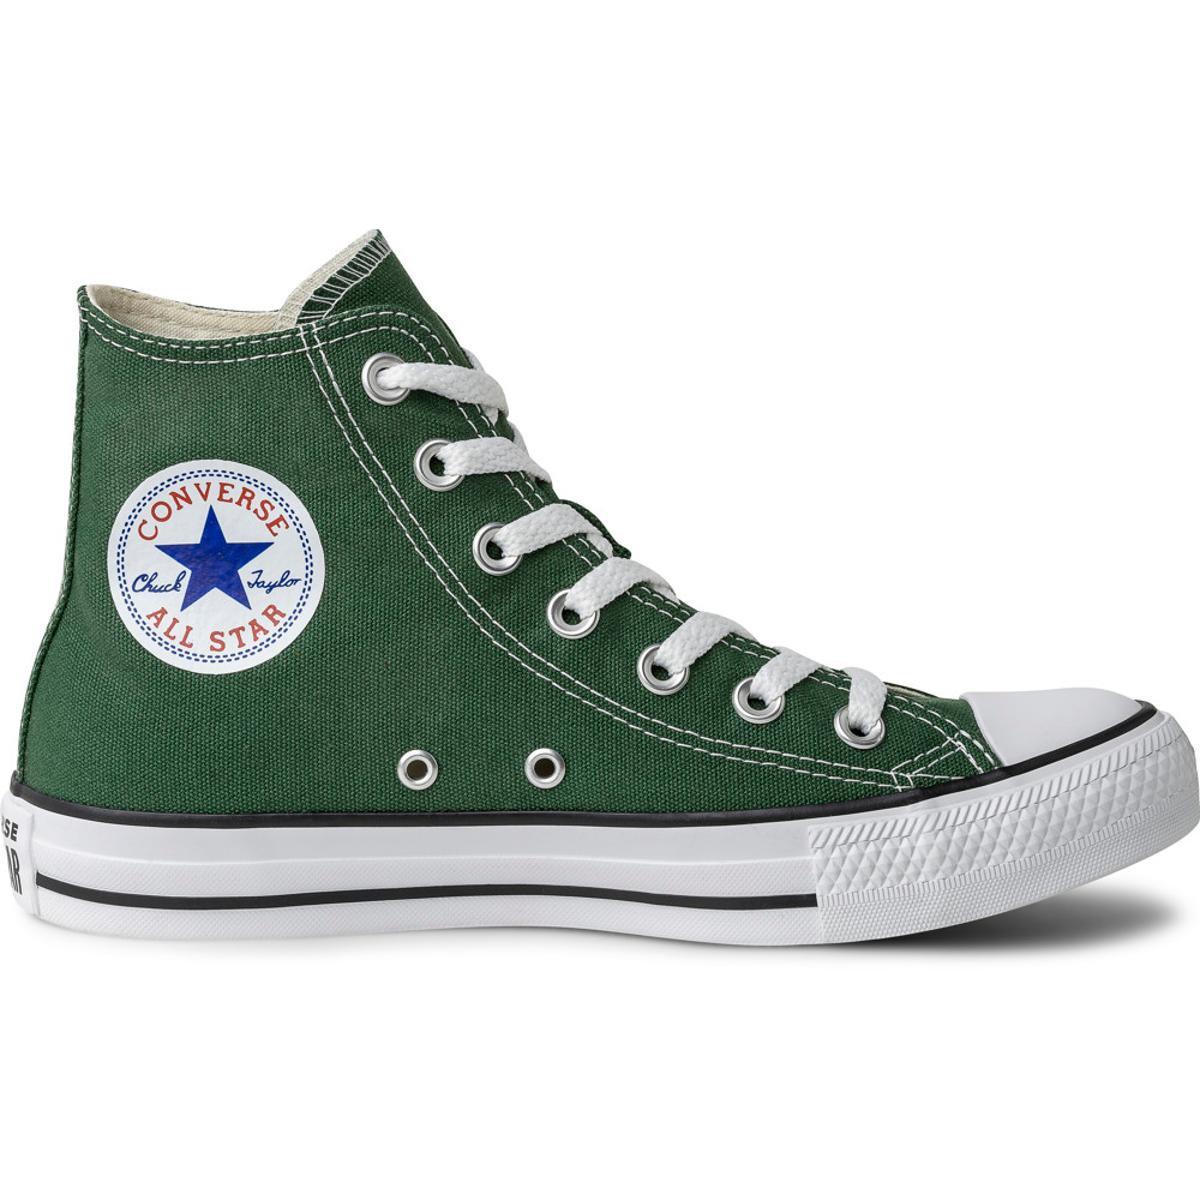 2all star converse verde